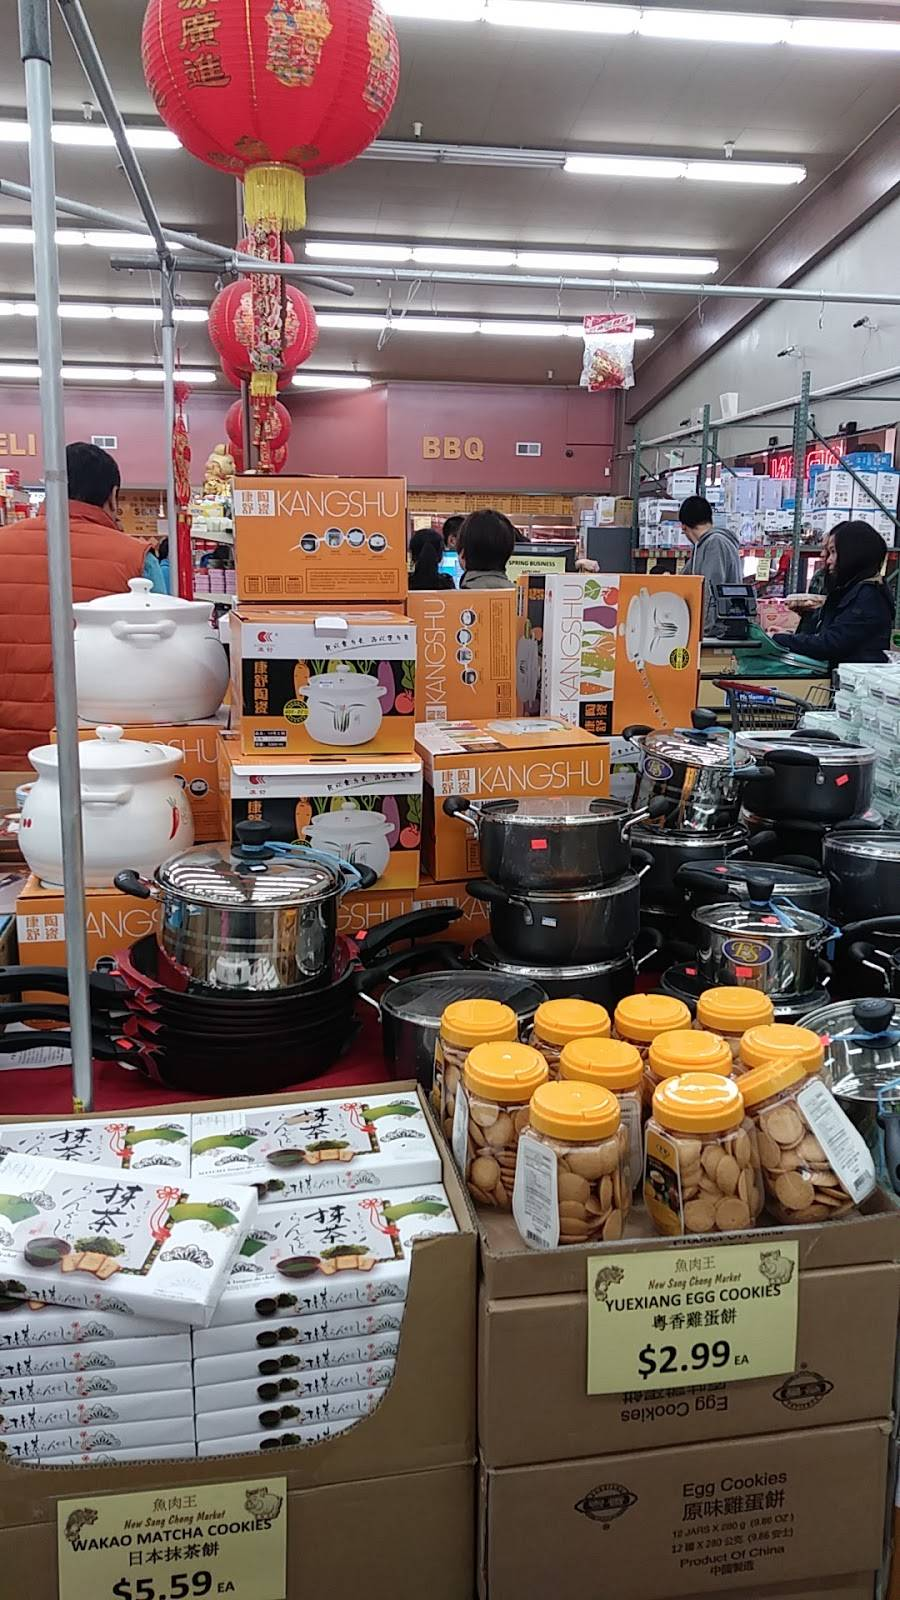 New Sang Chong Market 鱼 • 肉王海産肉食 - supermarket  | Photo 4 of 6 | Address: 13756 Doolittle Dr, San Leandro, CA 94577, USA | Phone: (510) 351-8233